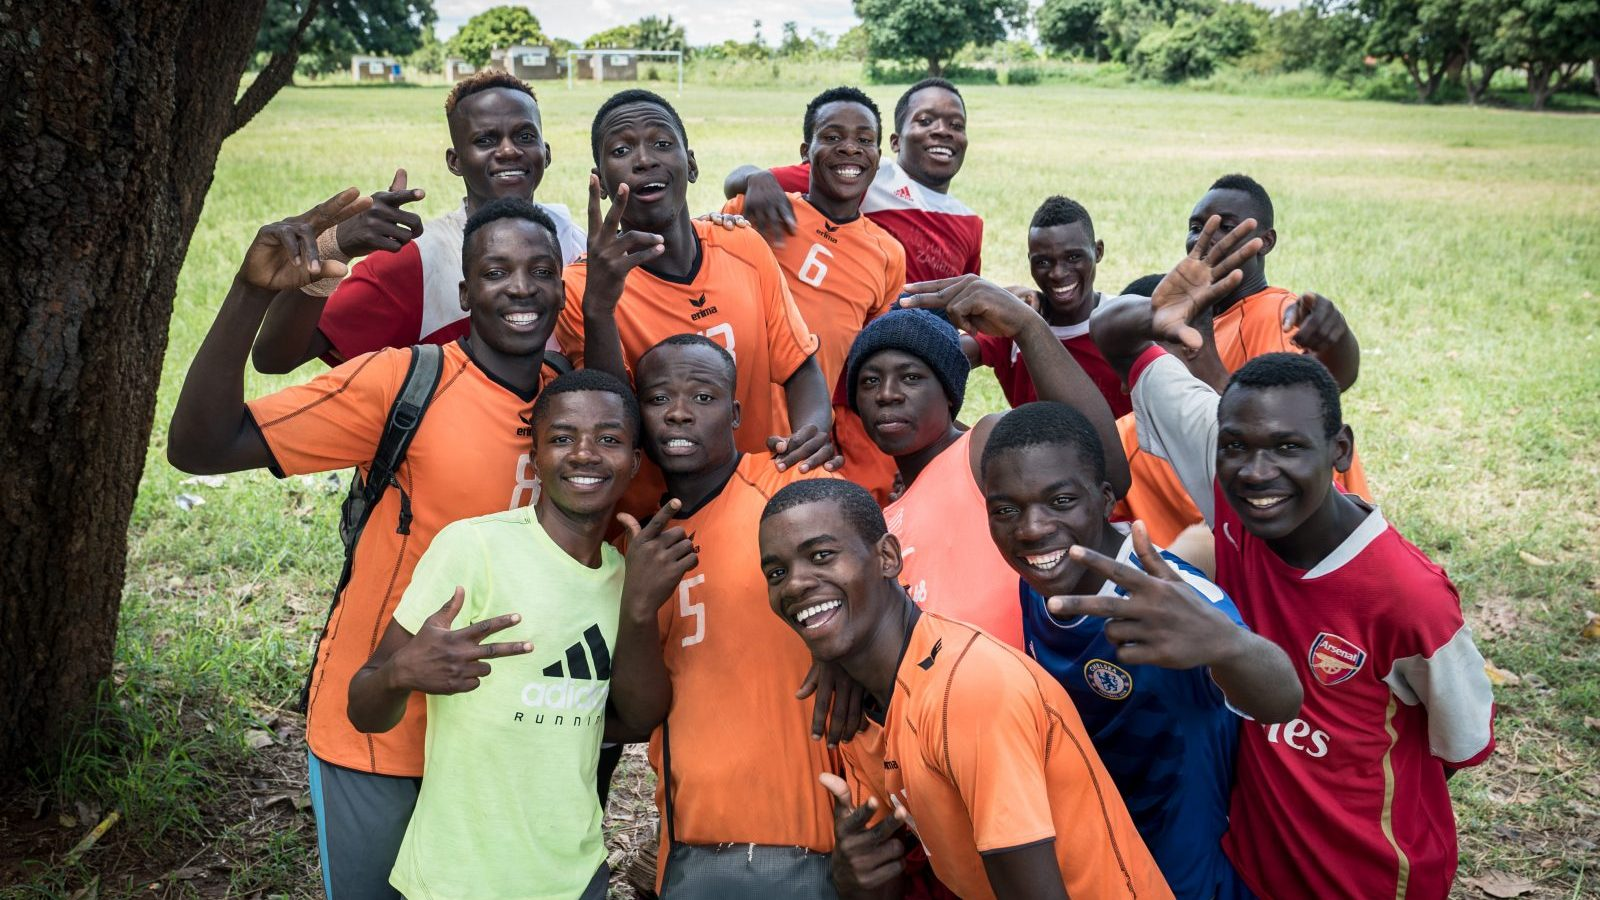 Celebrate the Zambian Handball Team's Journey to the